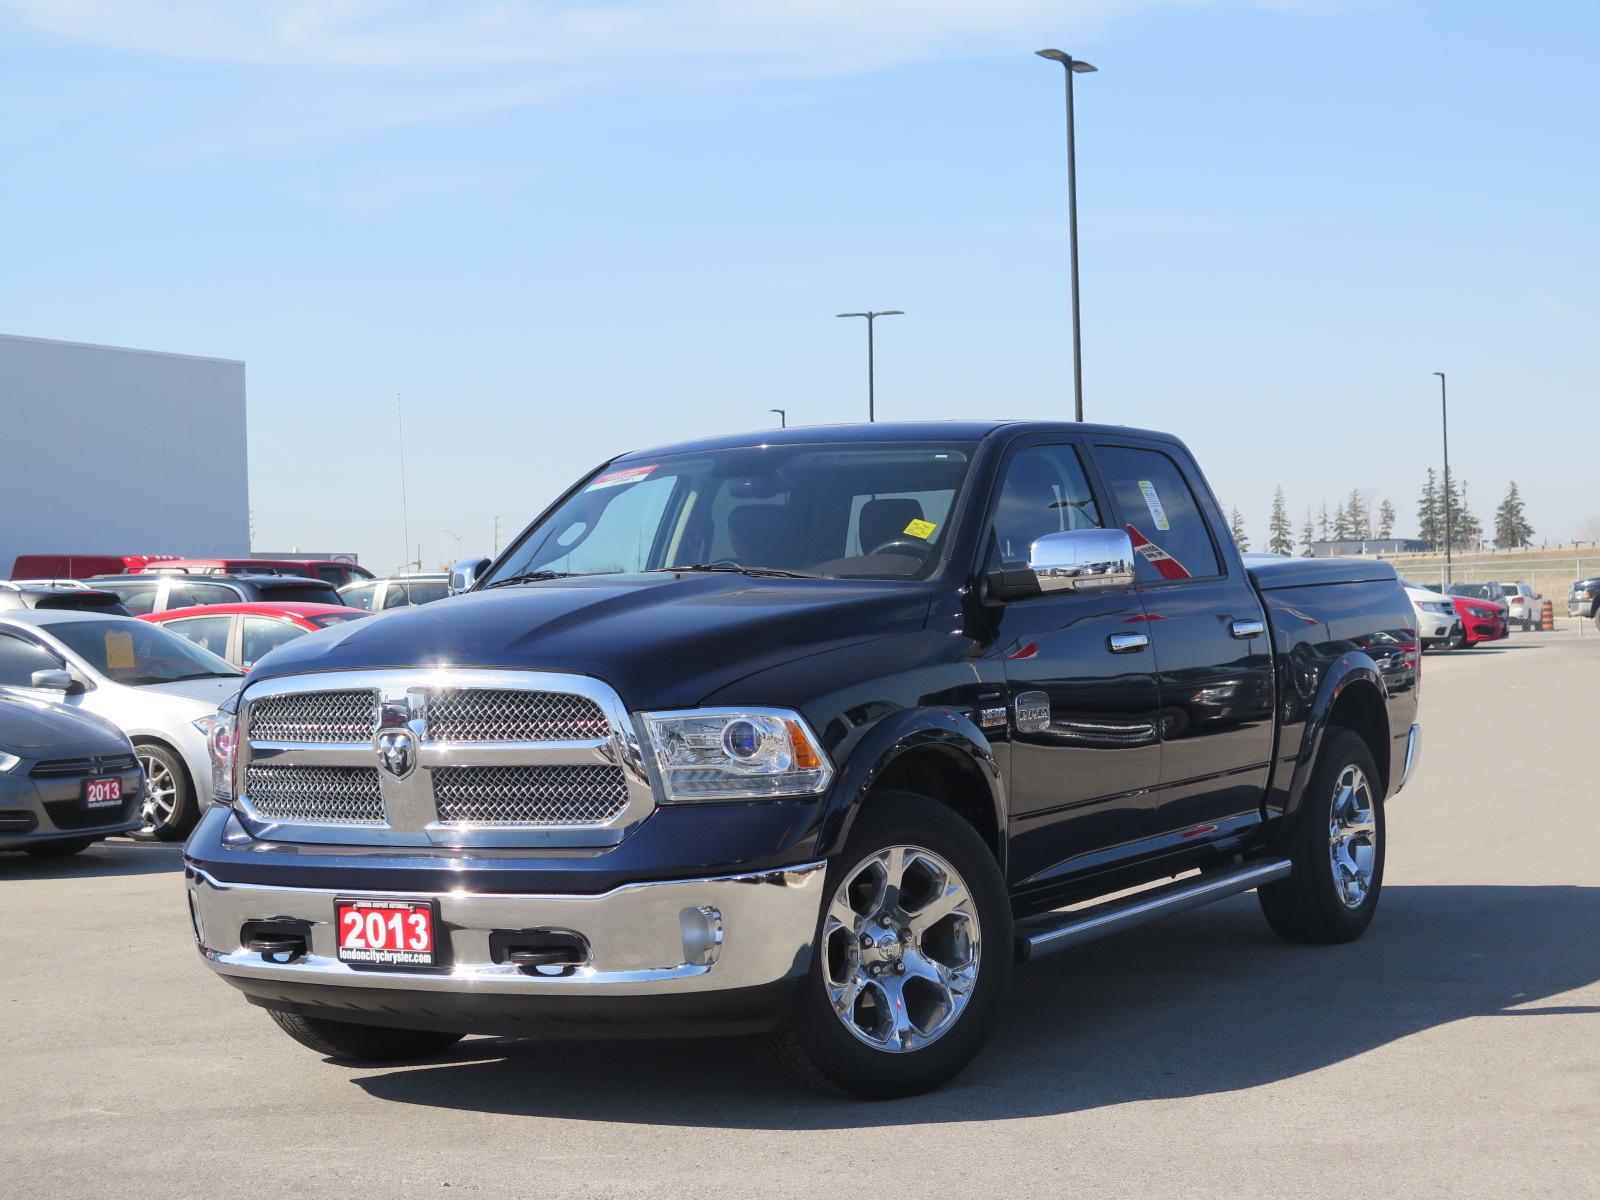 New 2013 Ram 1500, $35733